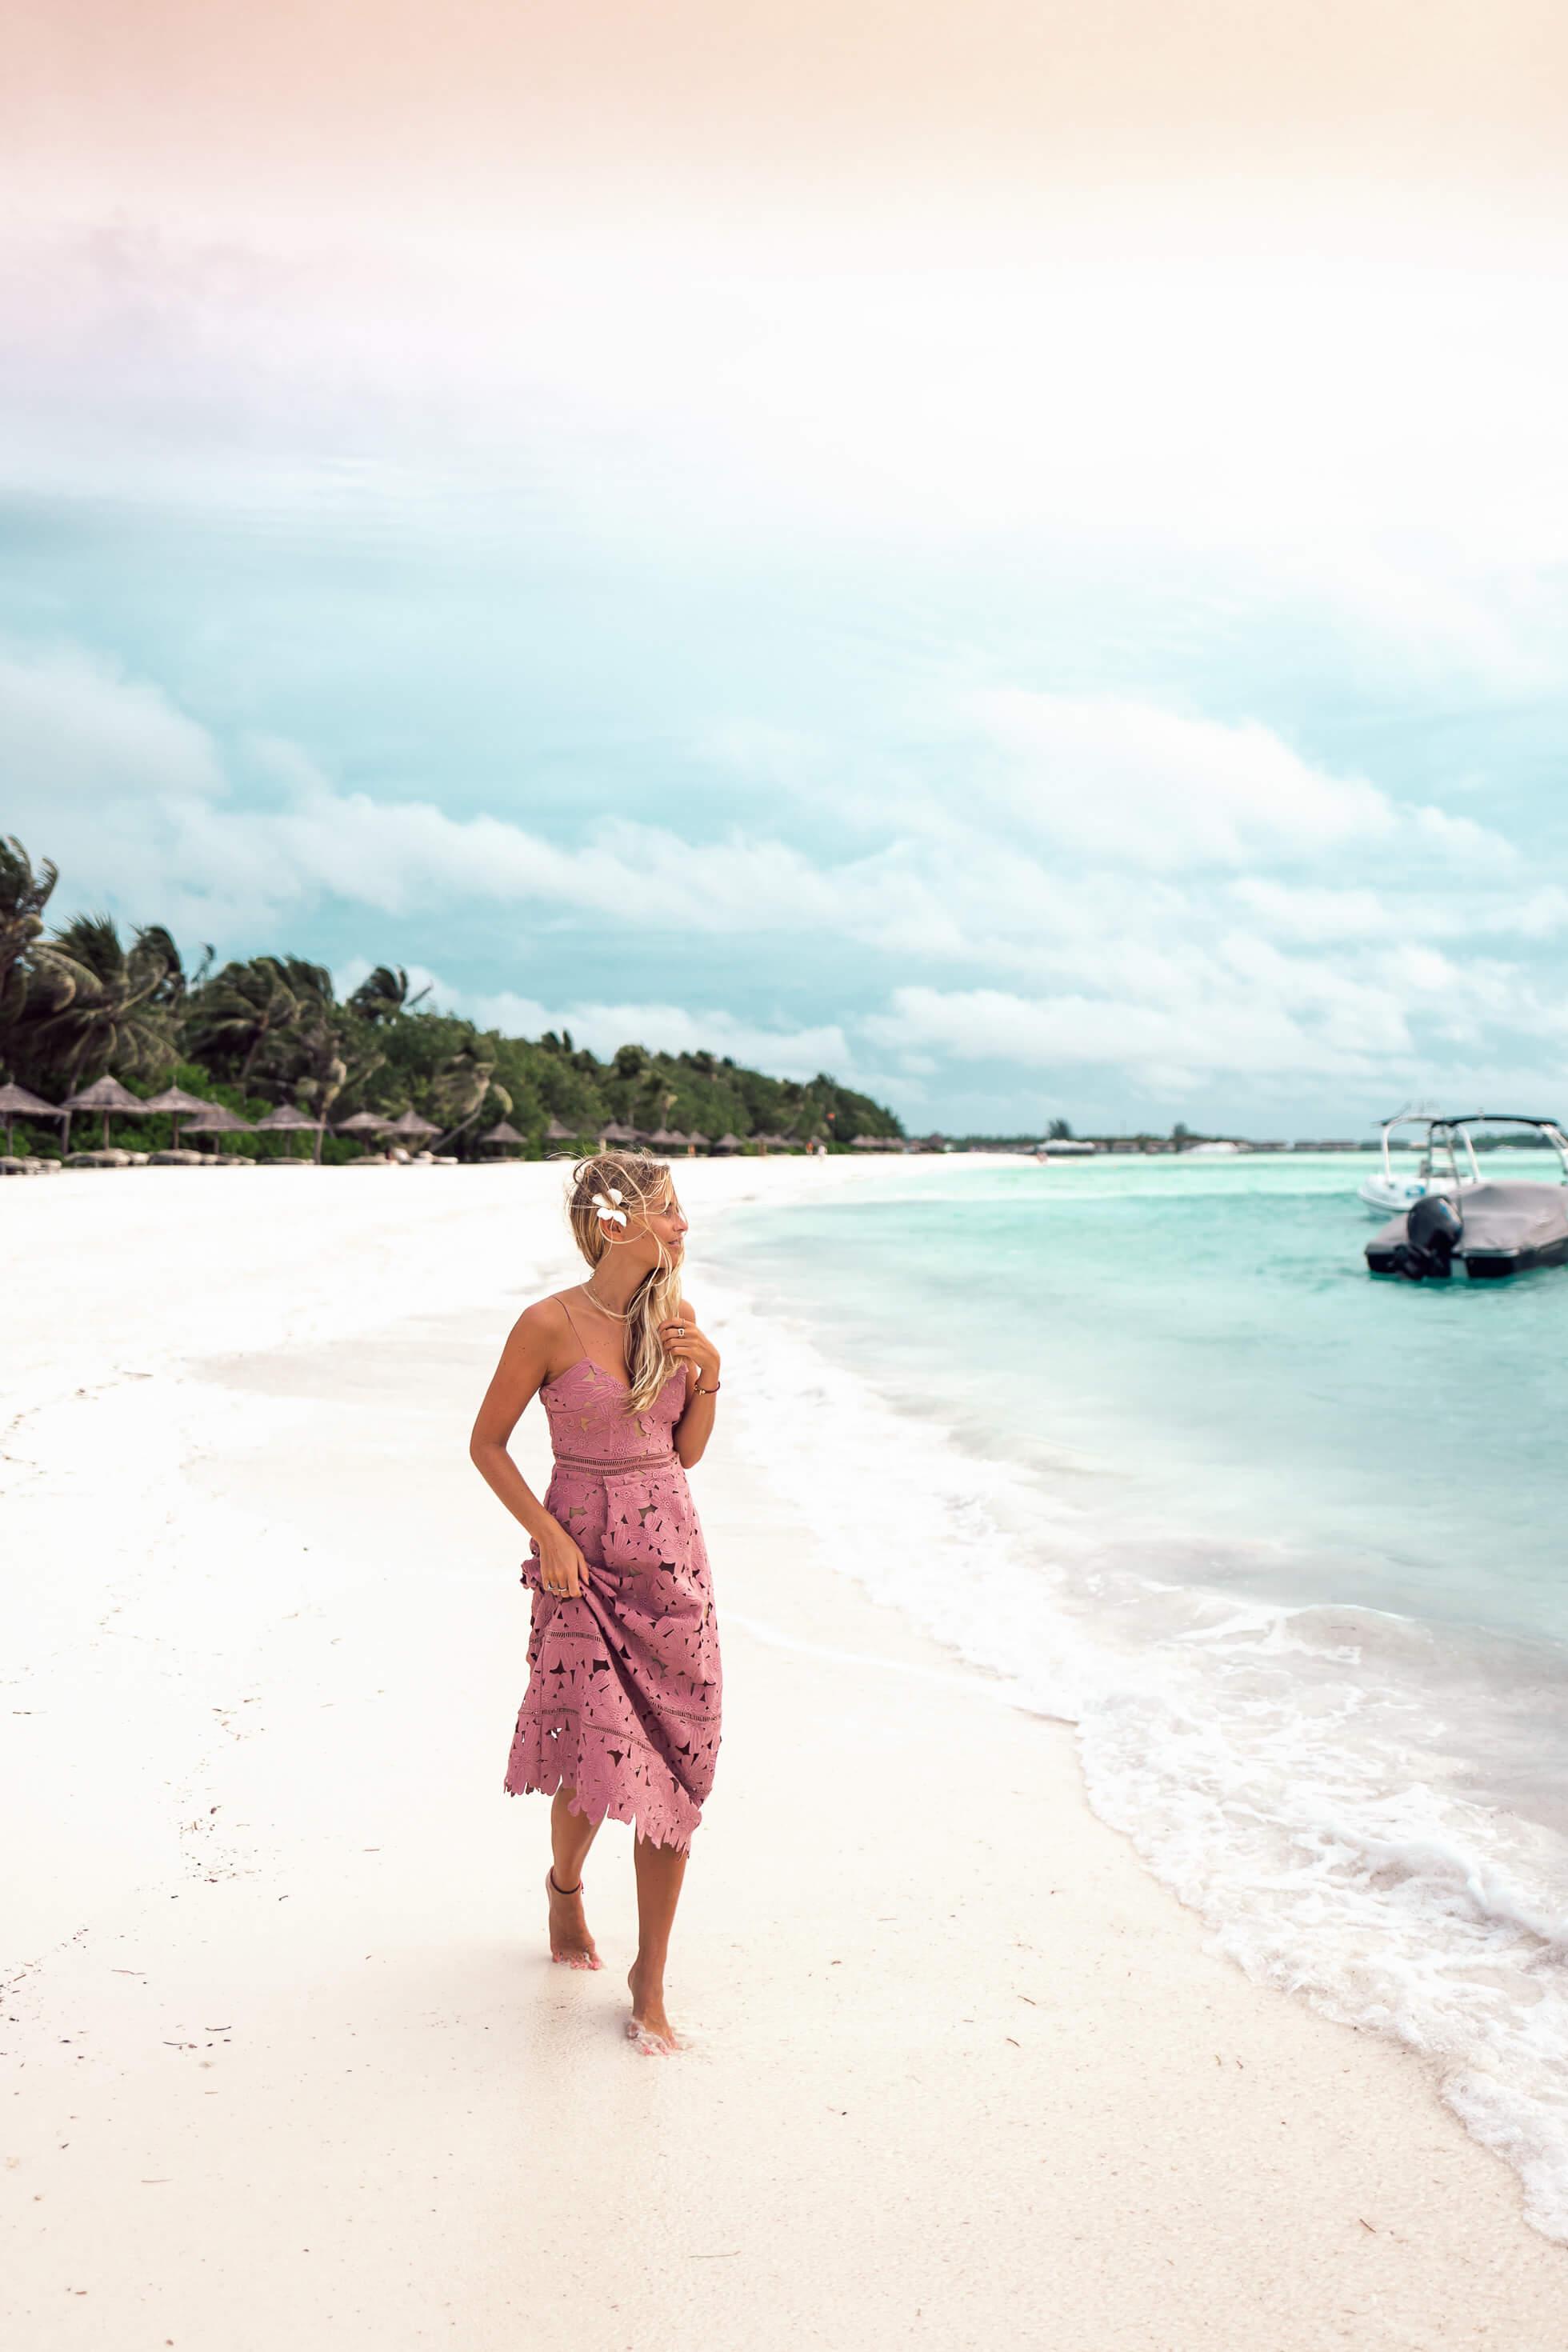 janni-deler-flower-dress-maldivesl1140990-redigera